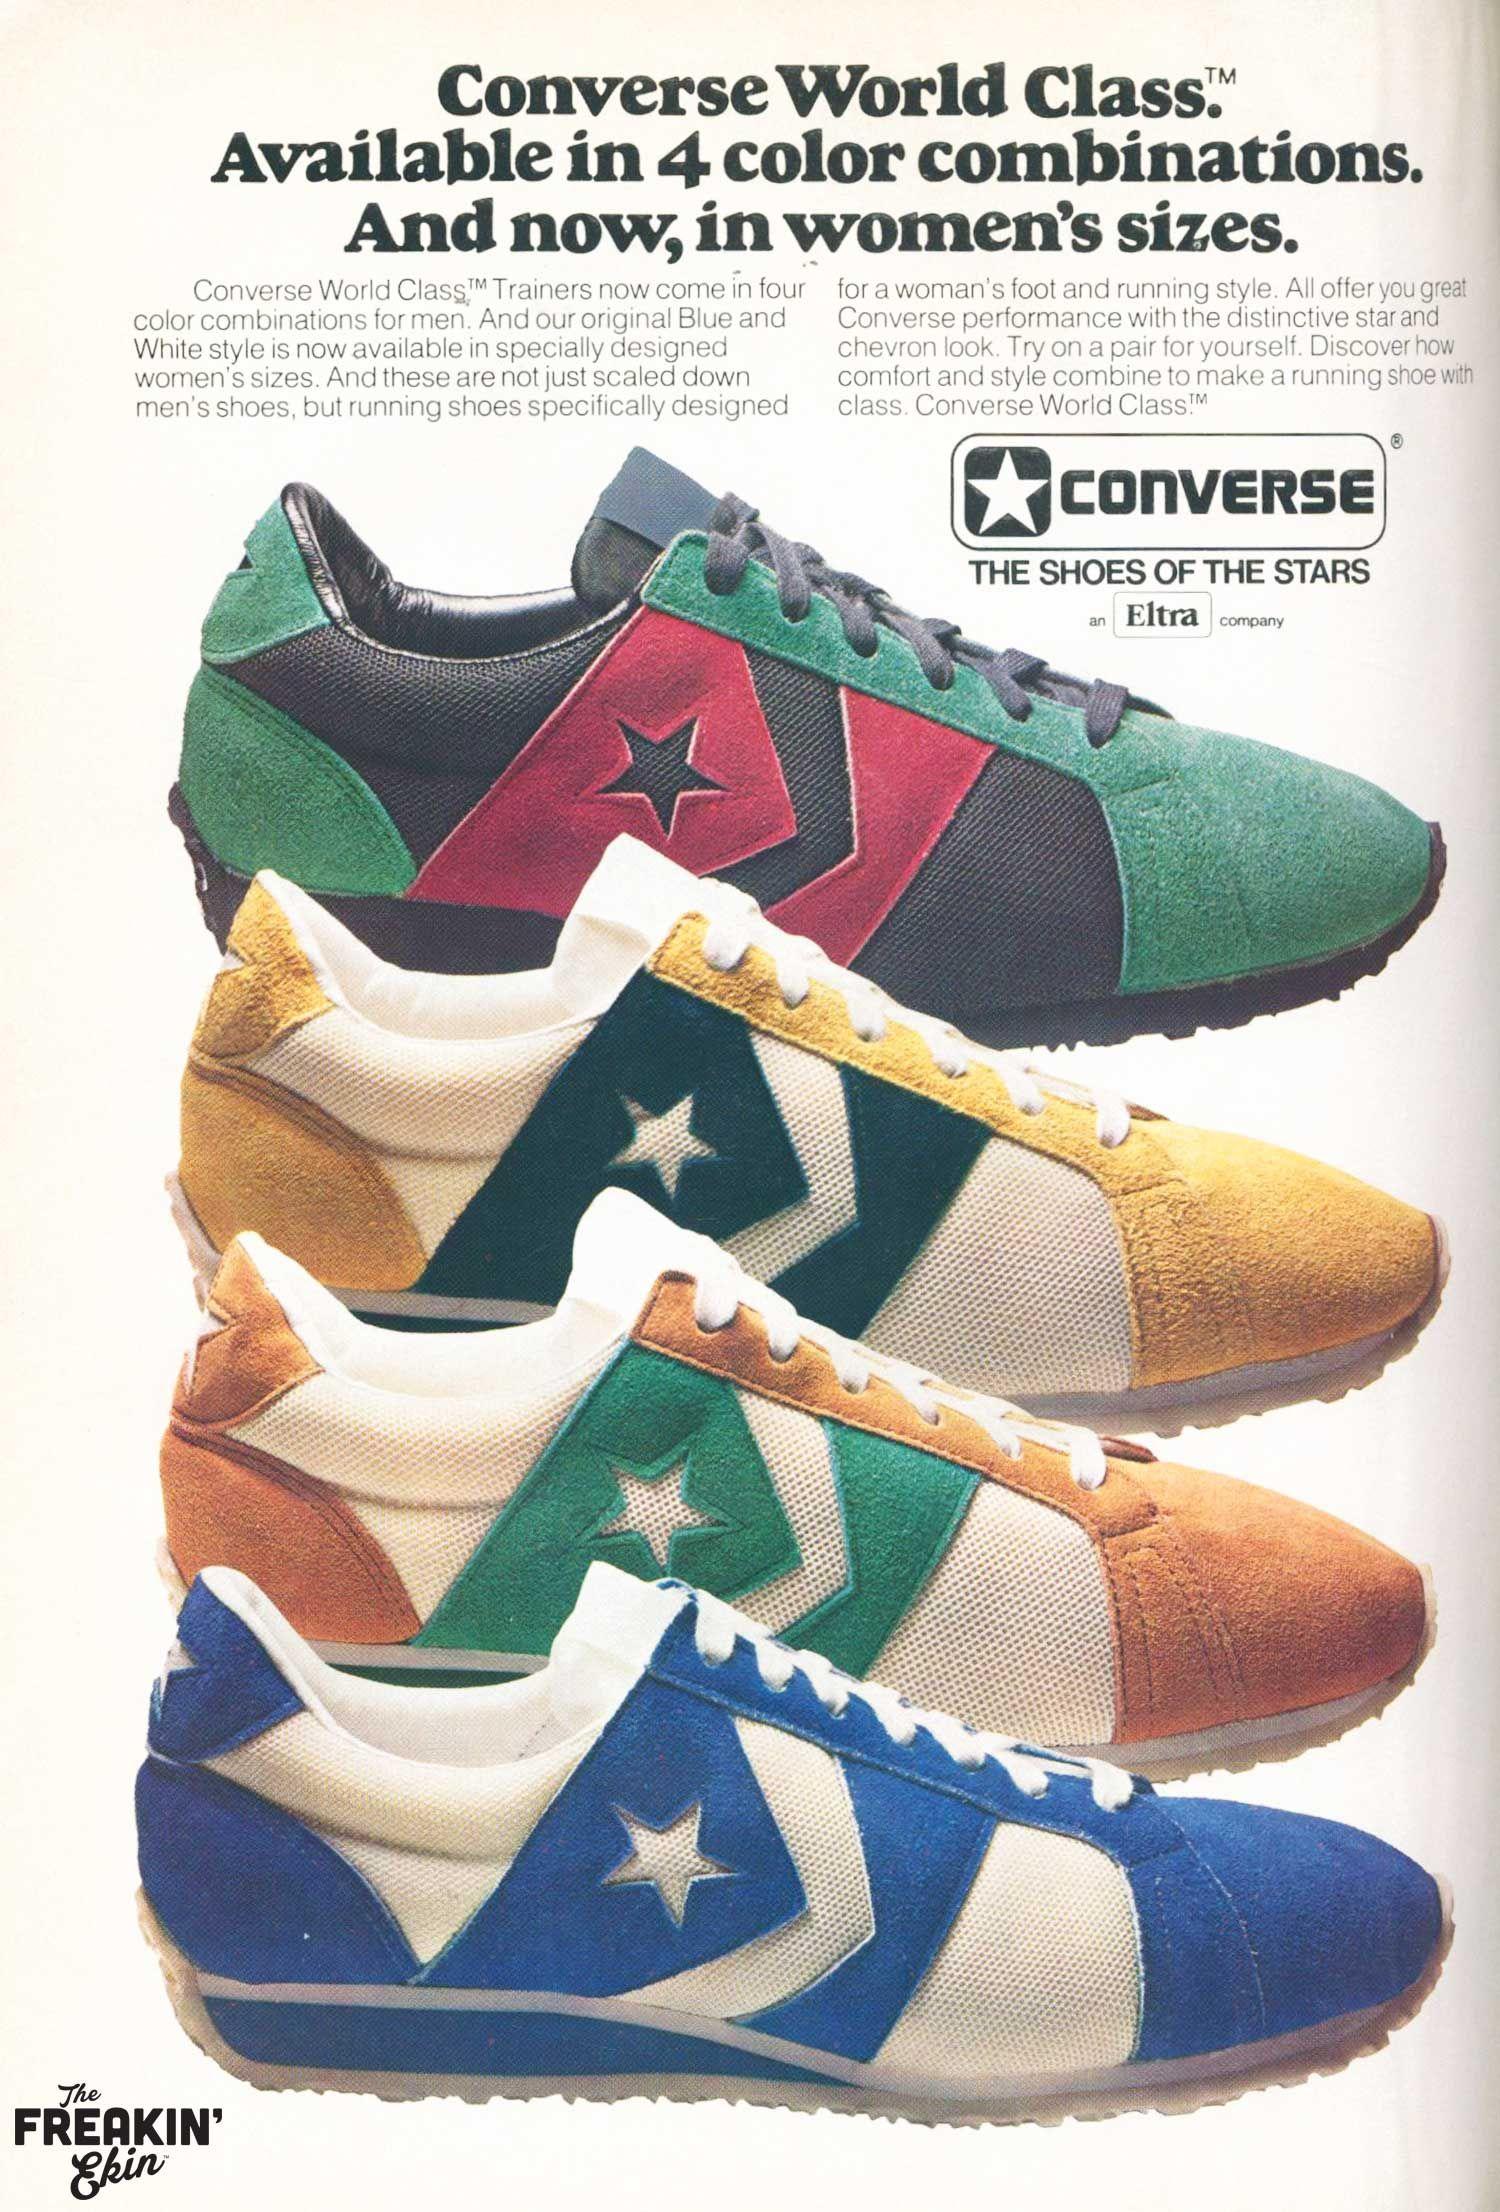 separation shoes b6d02 2fa78 Converse World Class 1977 vintage sneaker ad   the Freakin  Ekin